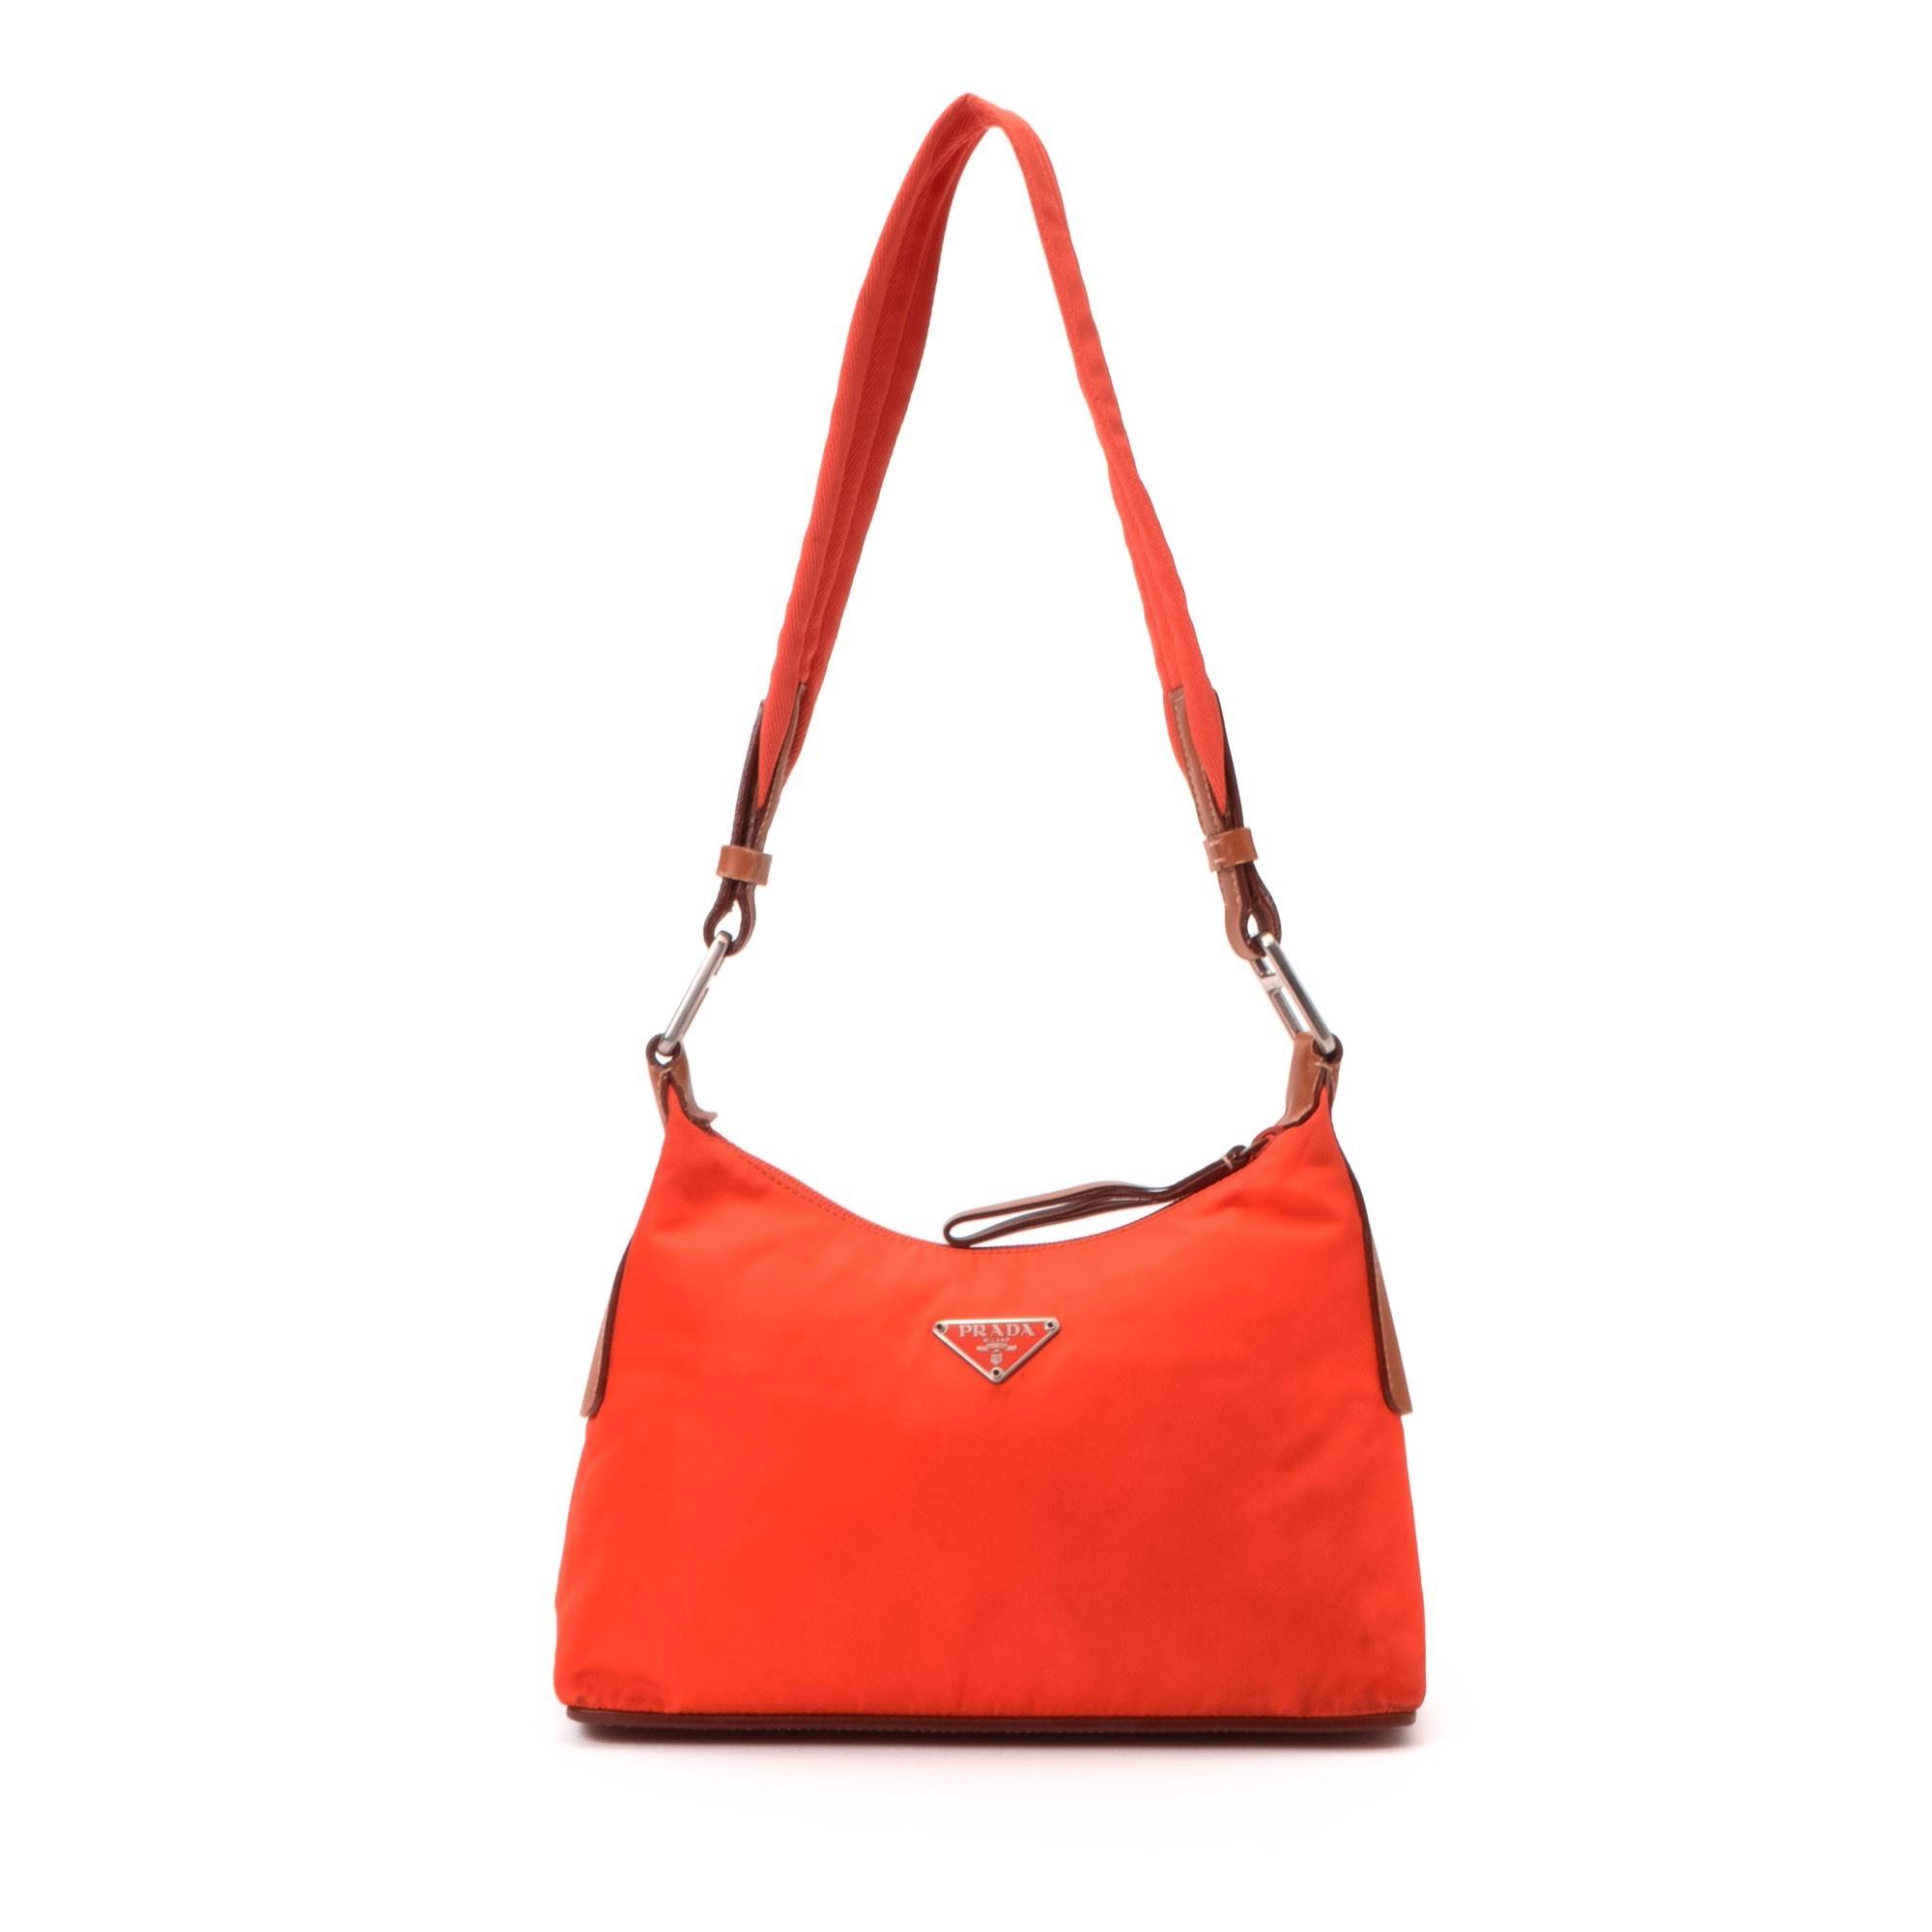 Shop Prada - LXR\u0026amp;CO Vintage Luxury